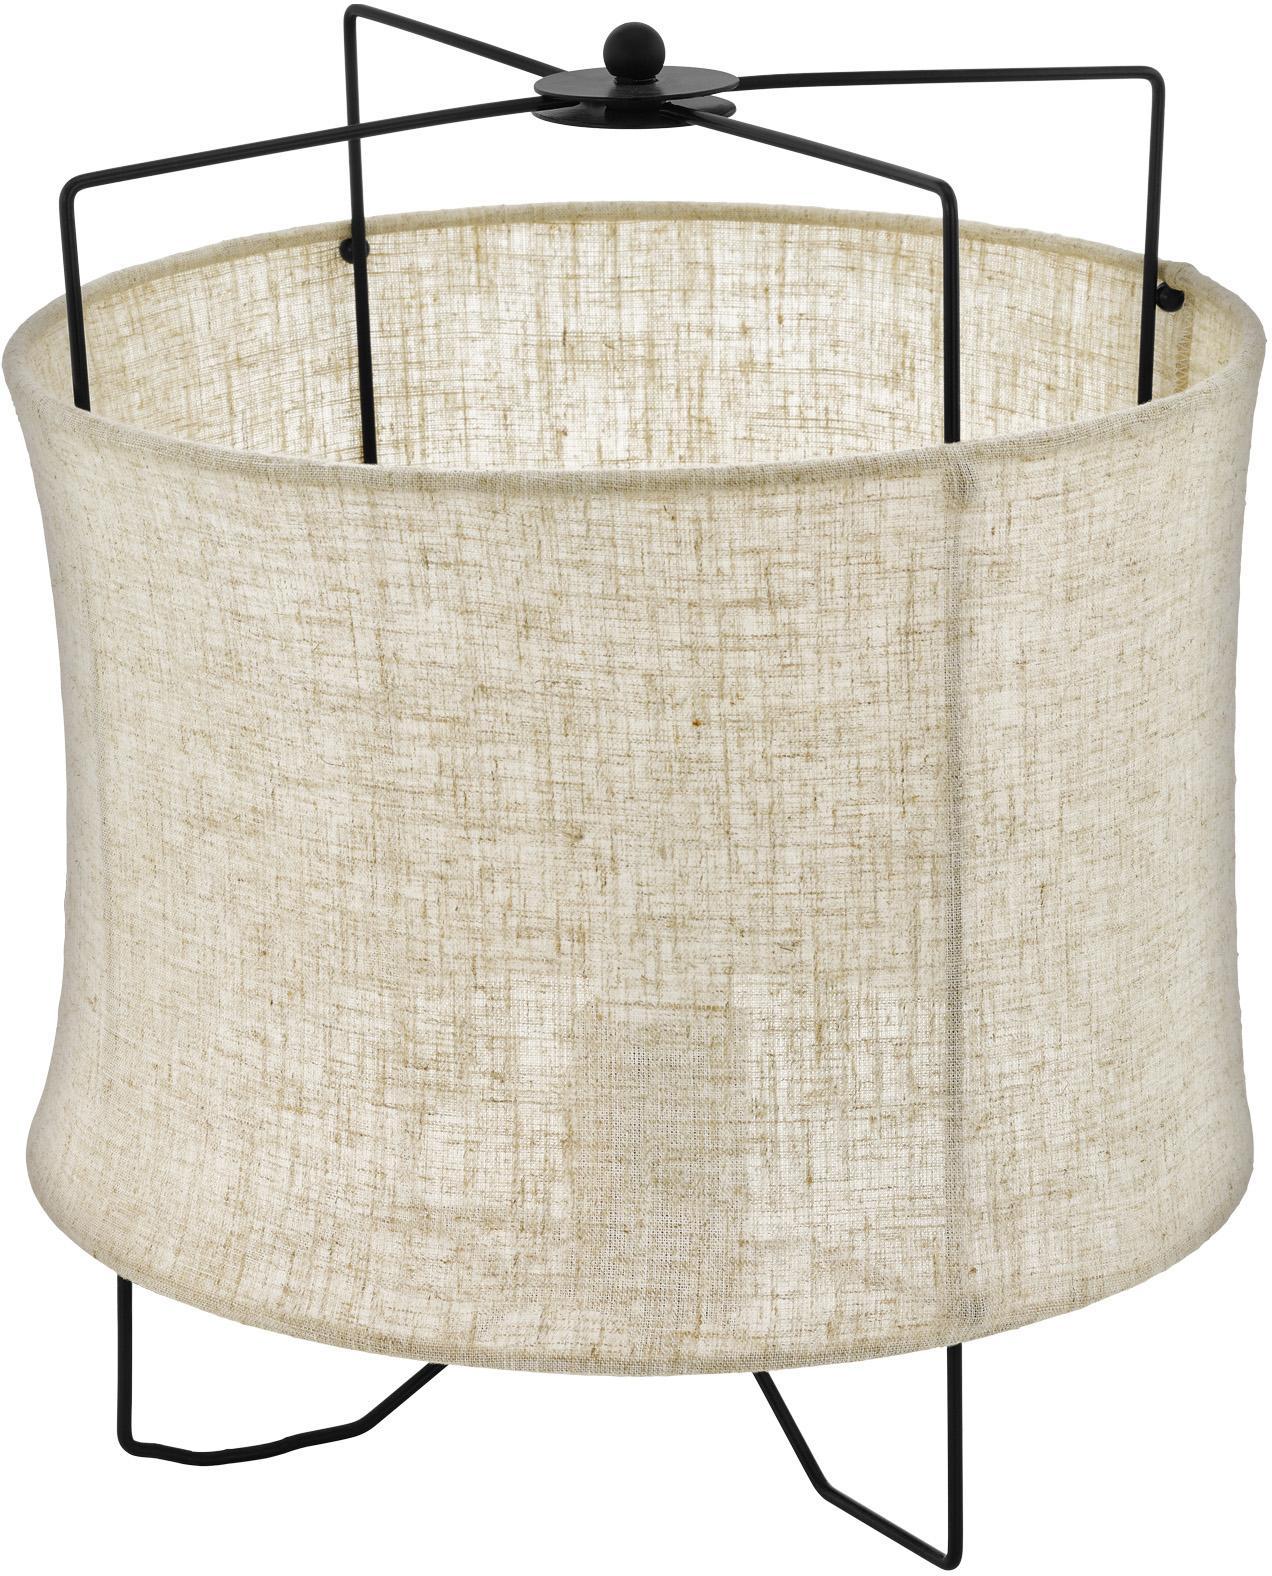 Lampada da tavolo Bridekirk, Paralume: lino, Struttura: metallo verniciato, Beige, Ø 30 x Alt. 34 cm